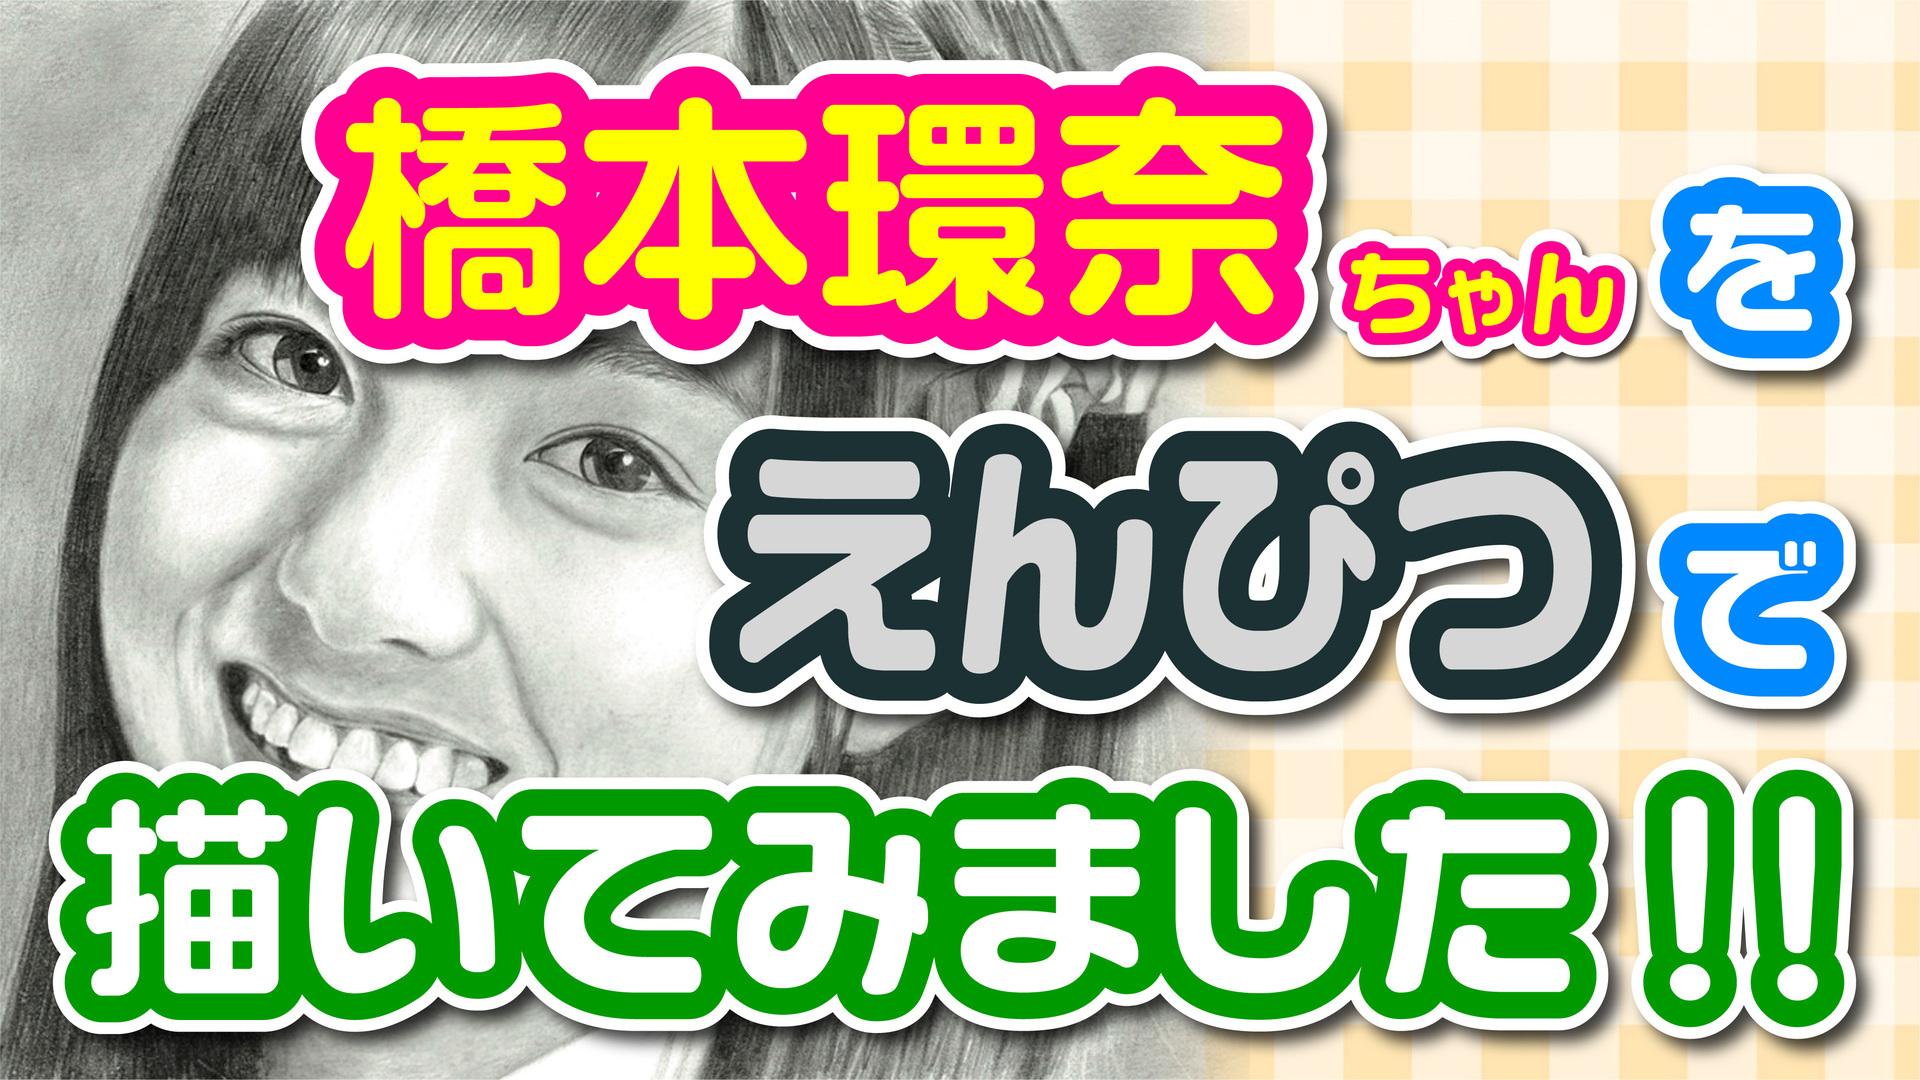 Youtubeサムネイル 橋本環奈鉛筆画.jpg